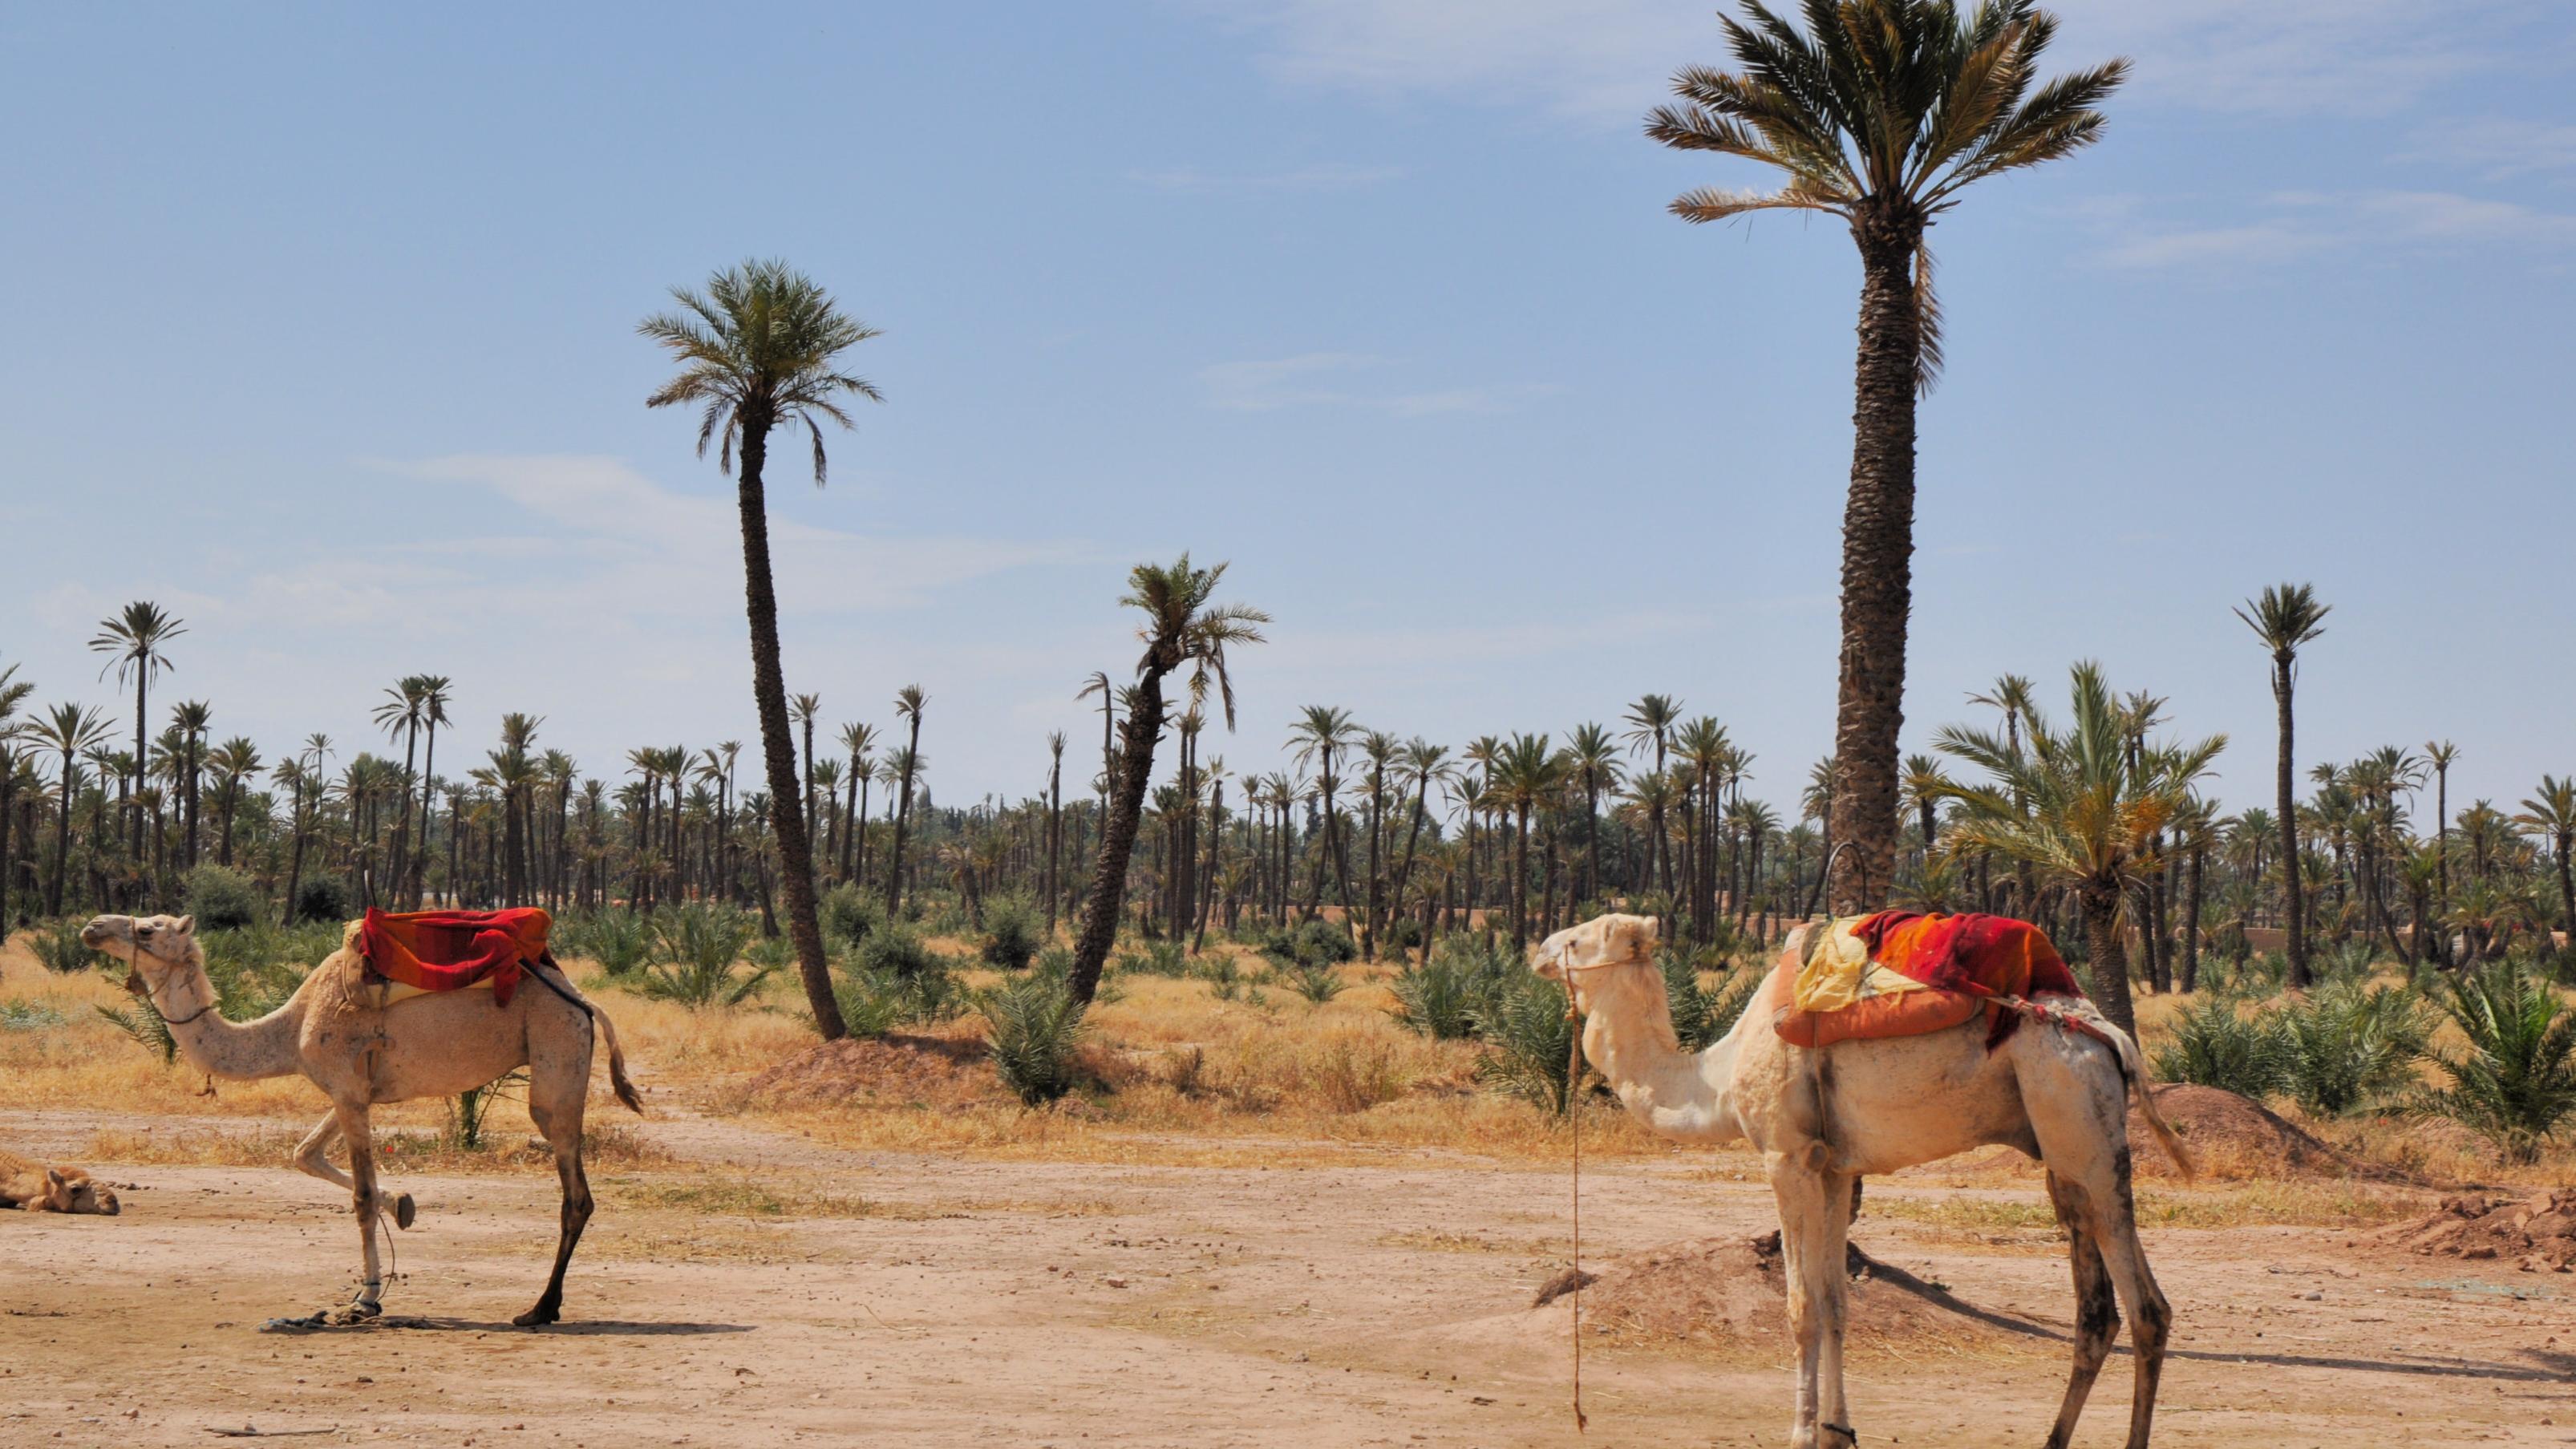 marrakeck-1516885271.jpg